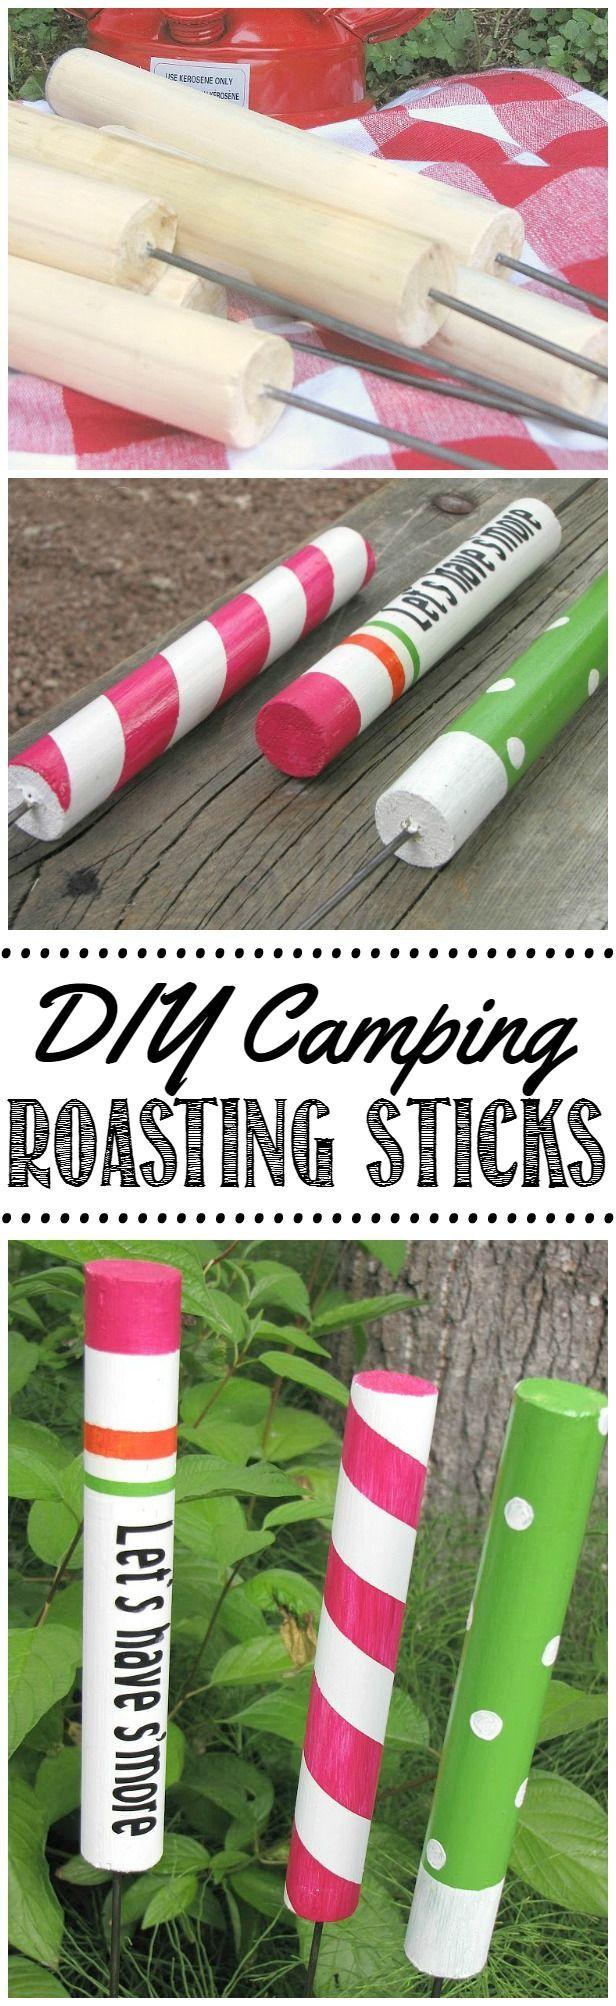 custom roasting sticks marshmallow backyard and camping